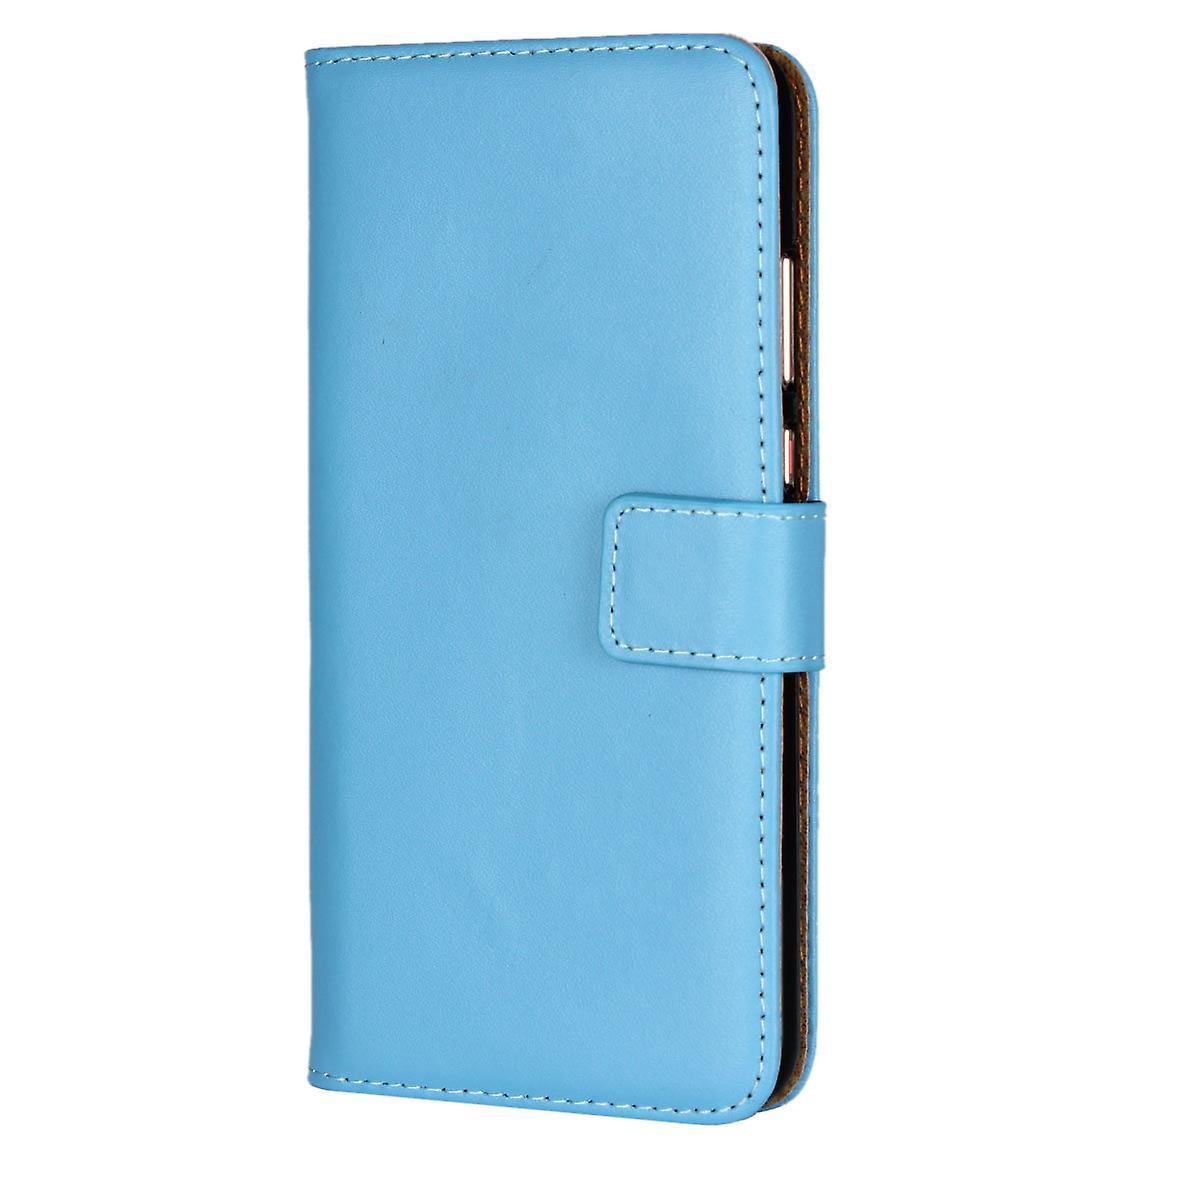 iCoverCase | Huawei Honor 8 Pro | plånboksfodral